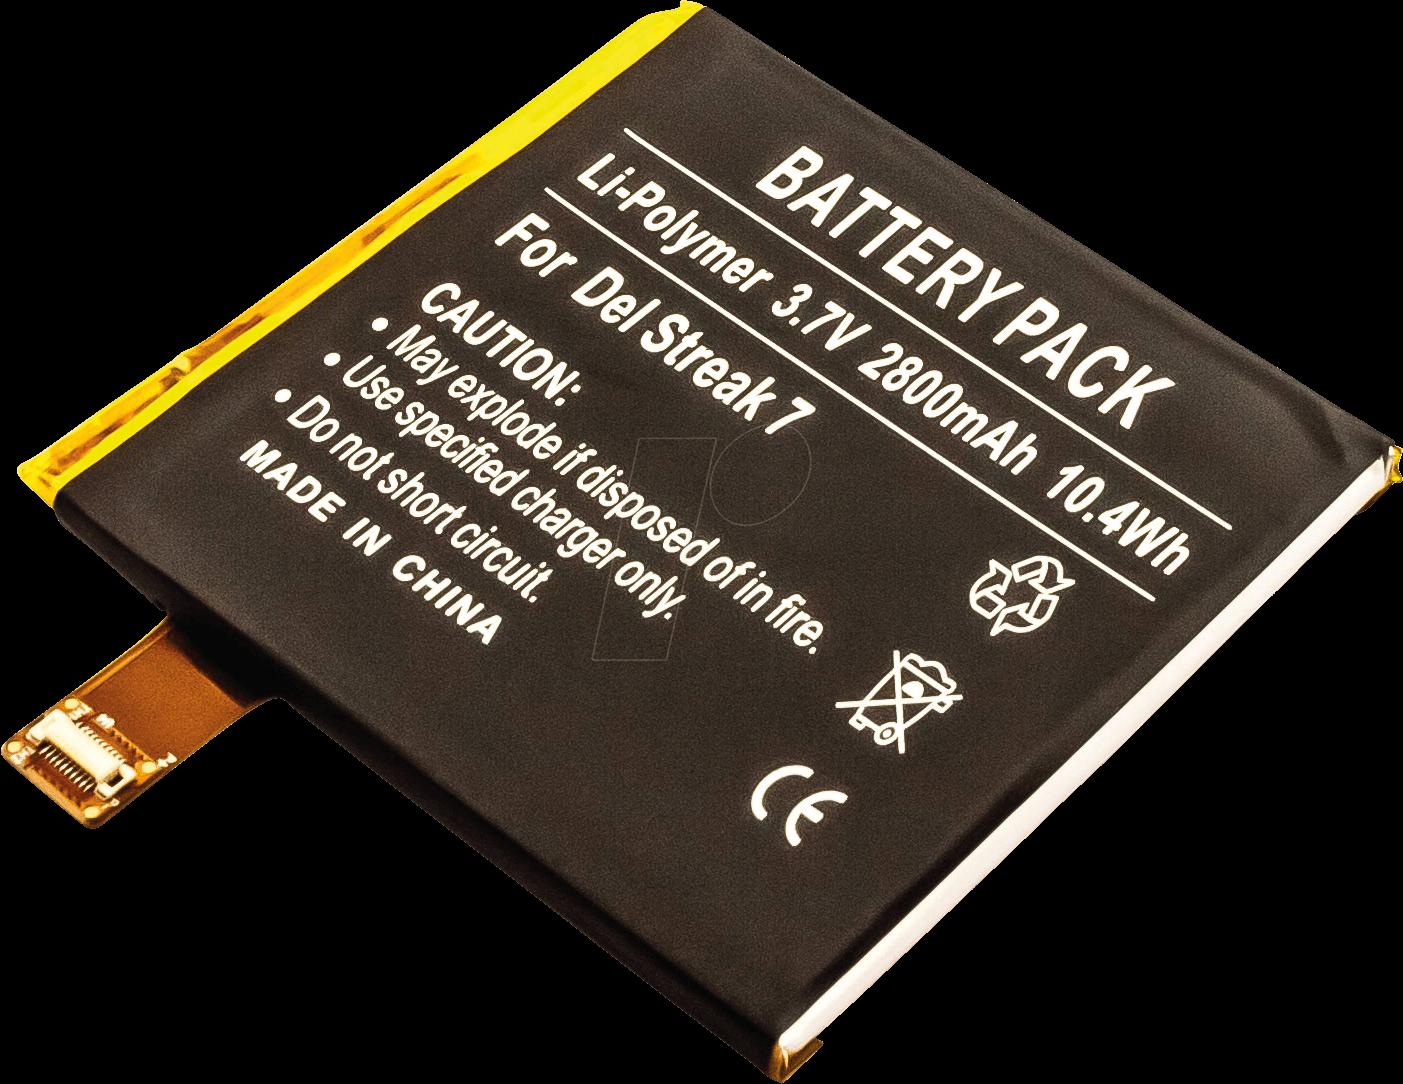 Akku 30587 Tablet Battery For Dell Streak Li Po 2800 Mah At Short Circuit Frei